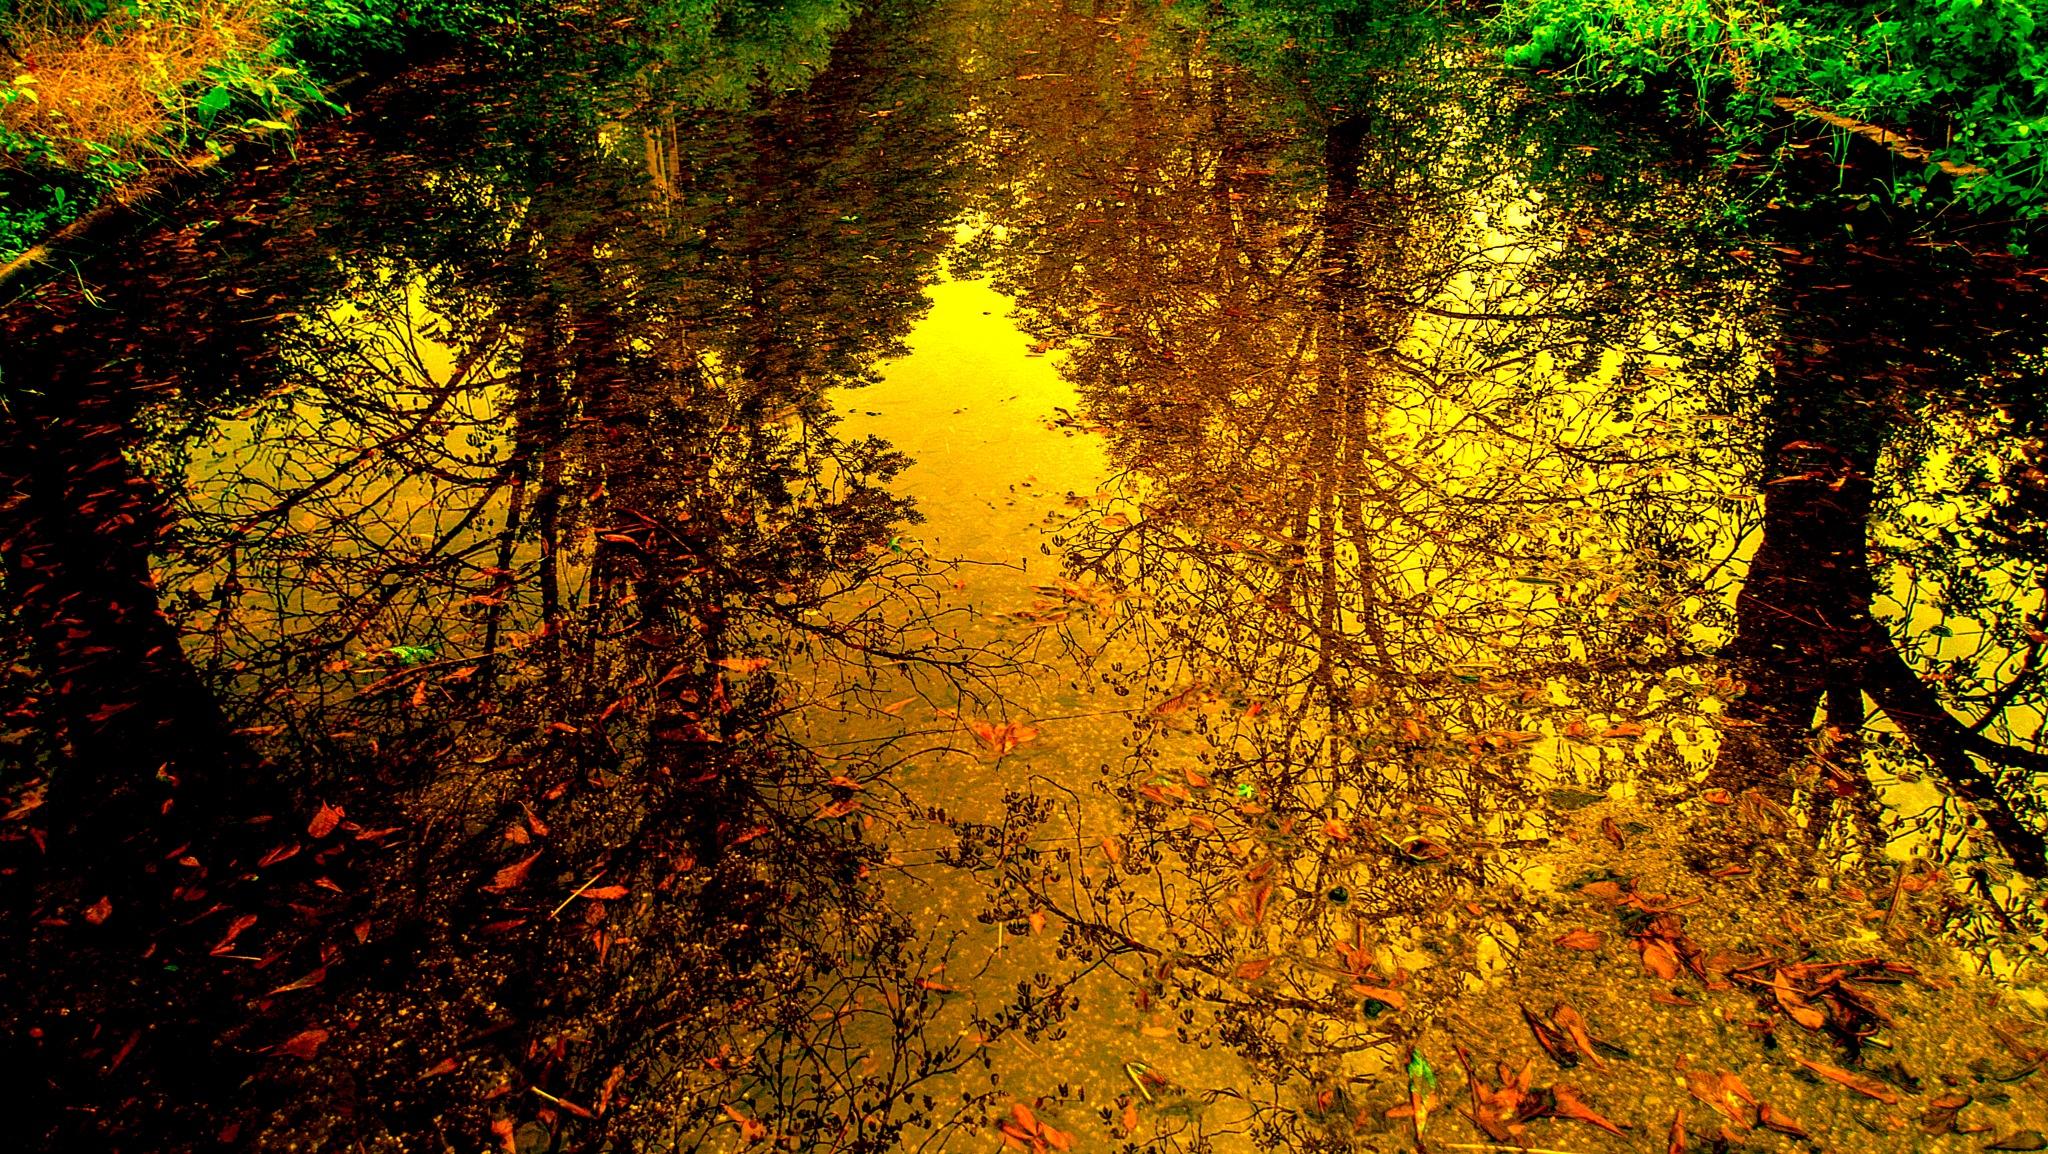 """After the rain"" by Mladen Marinov (MM)"